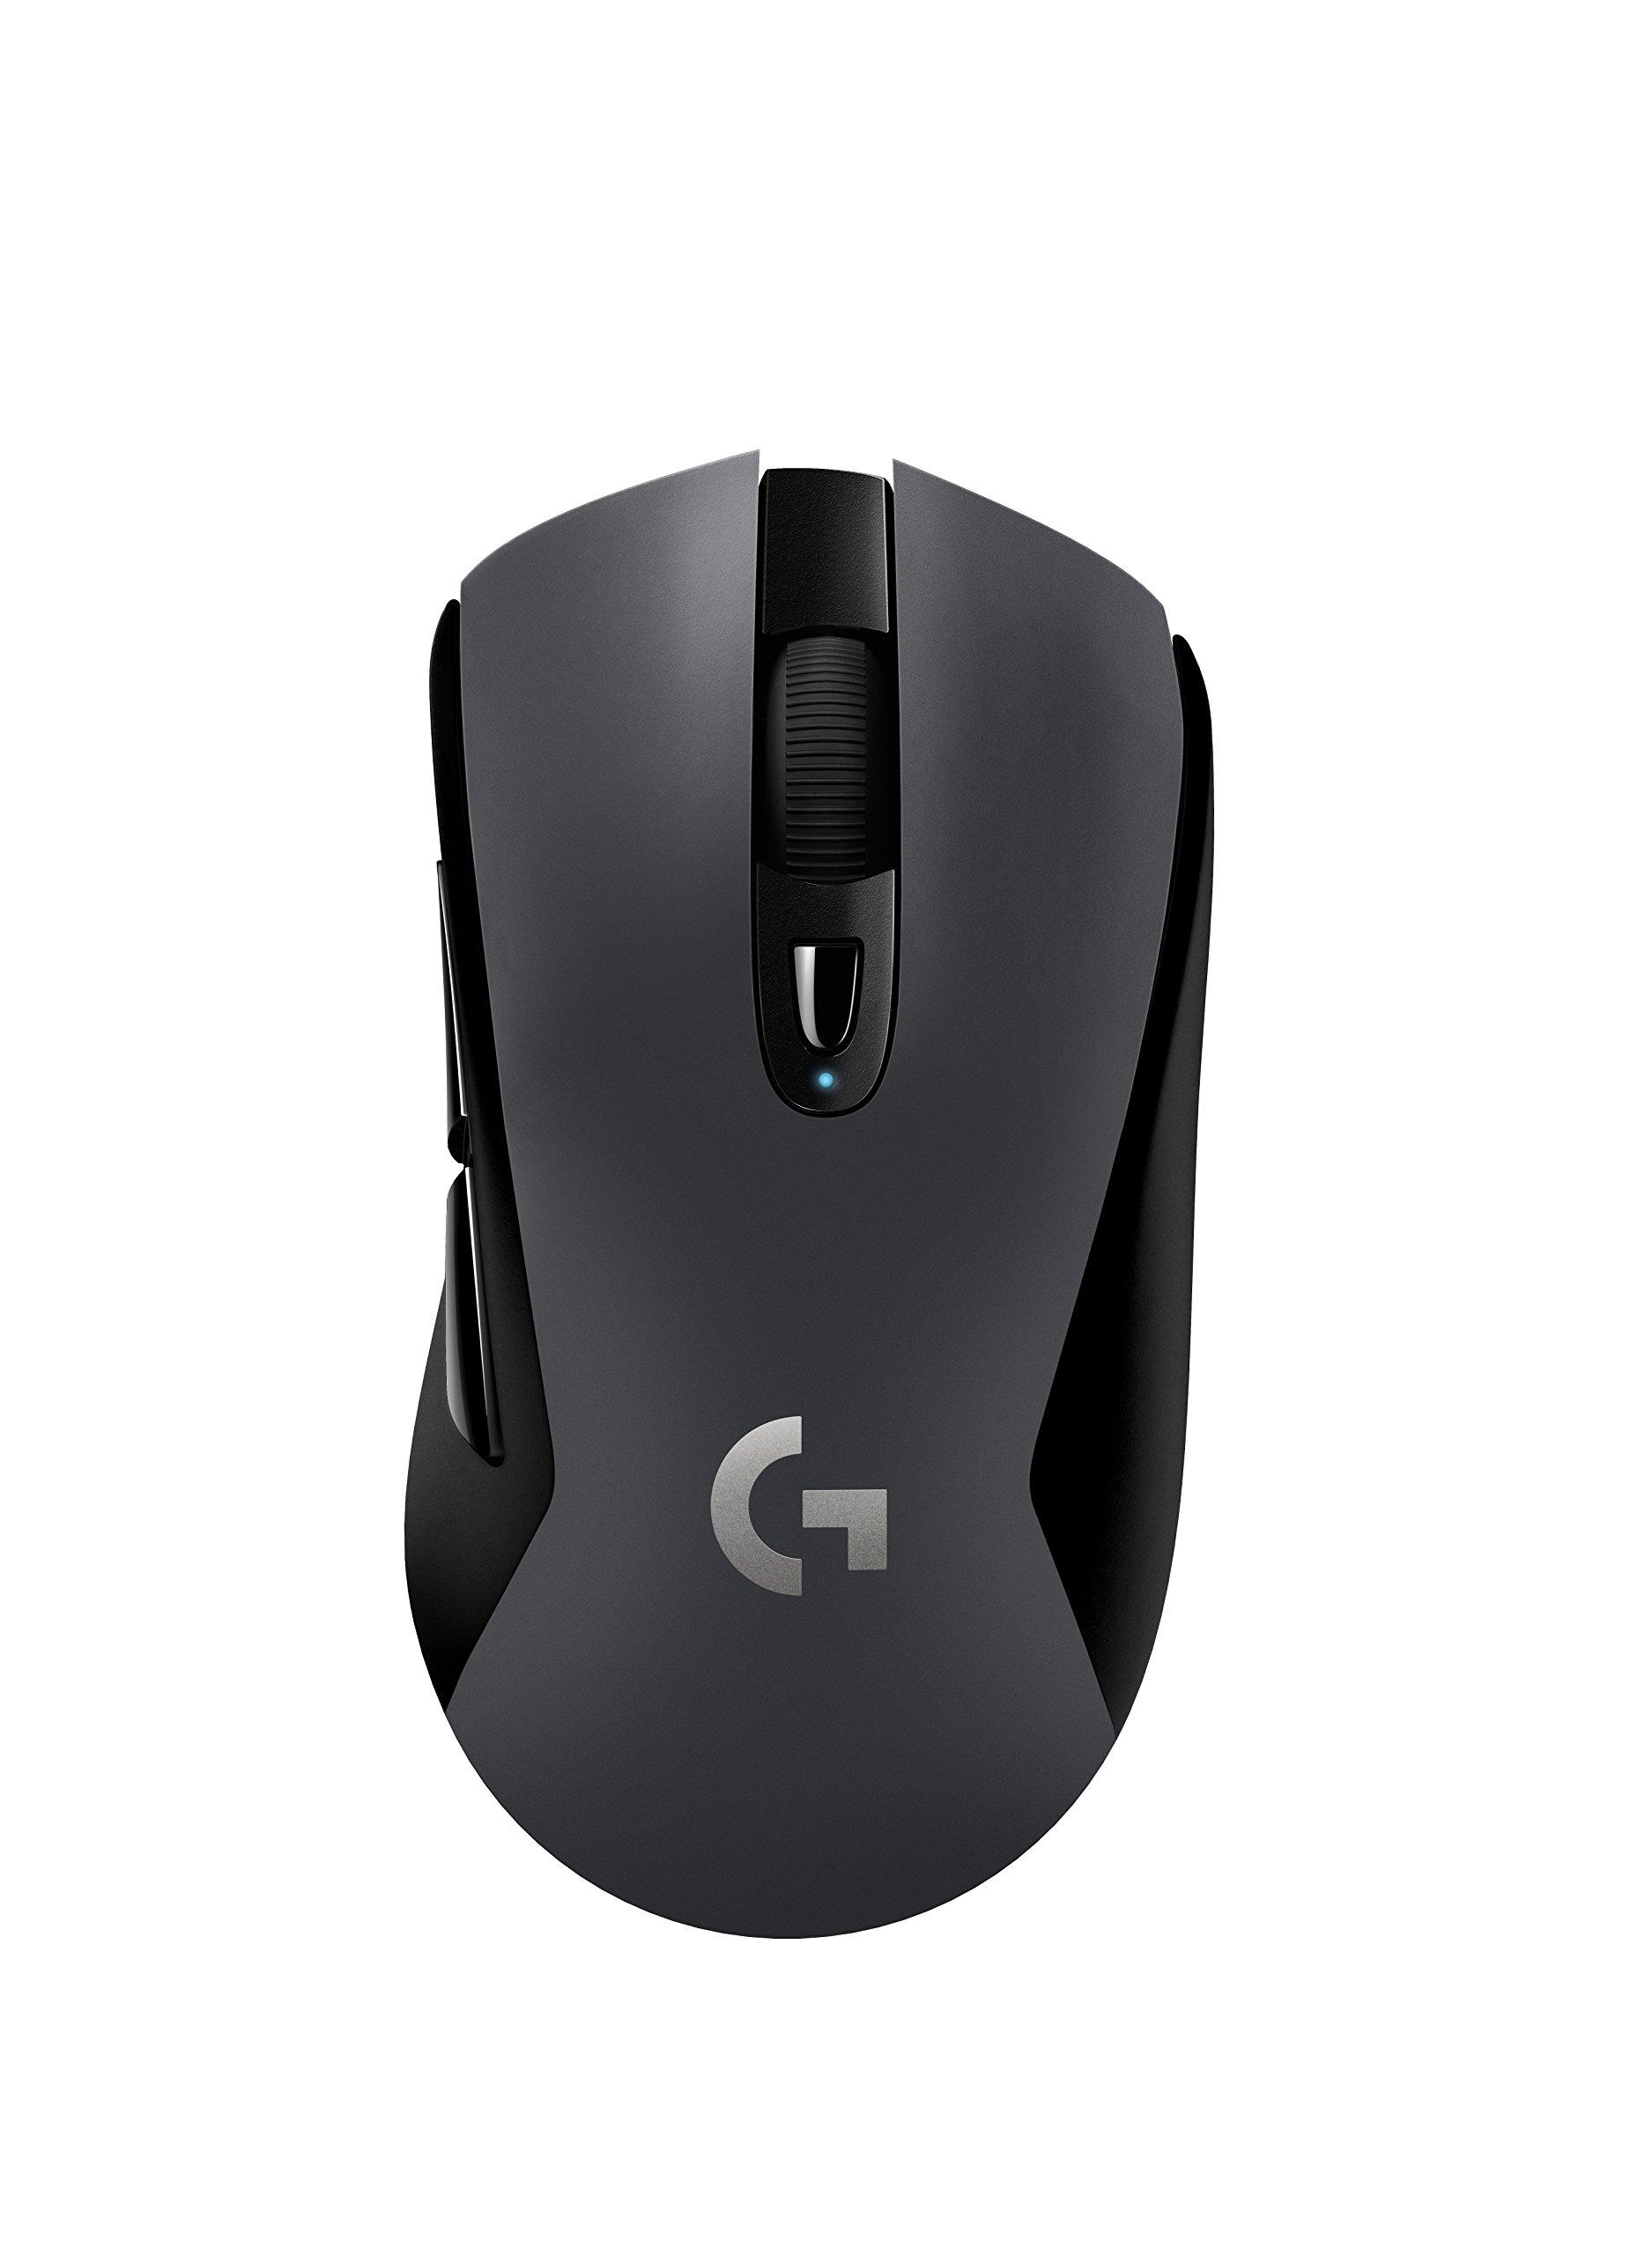 Mouse Gamer : Logitech G603 LIGHTSPEED Sin Cable